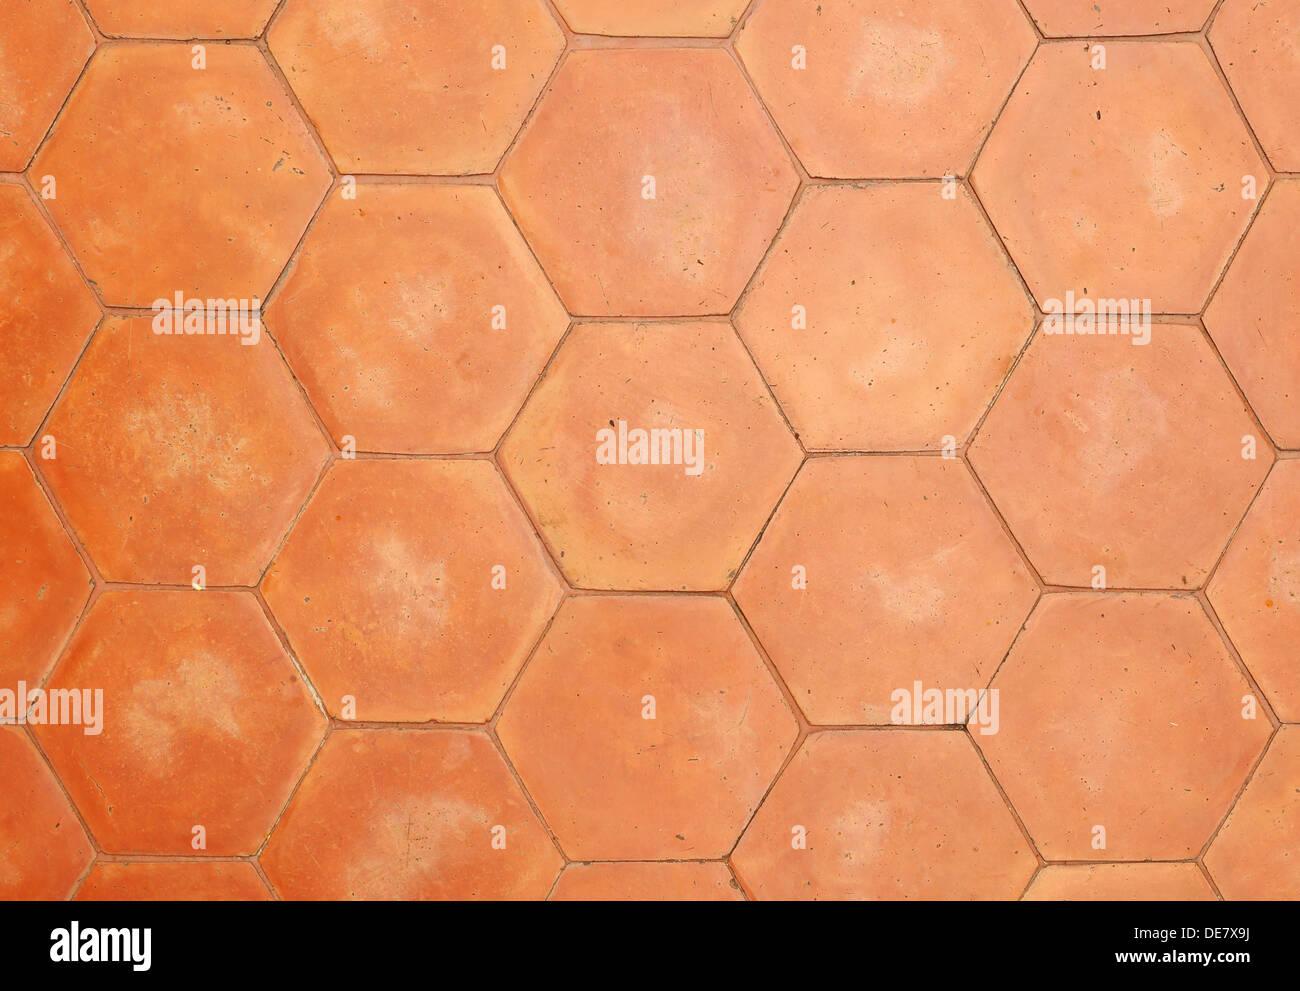 Esagonale piastrelle in argilla sfondo texture foto immagine